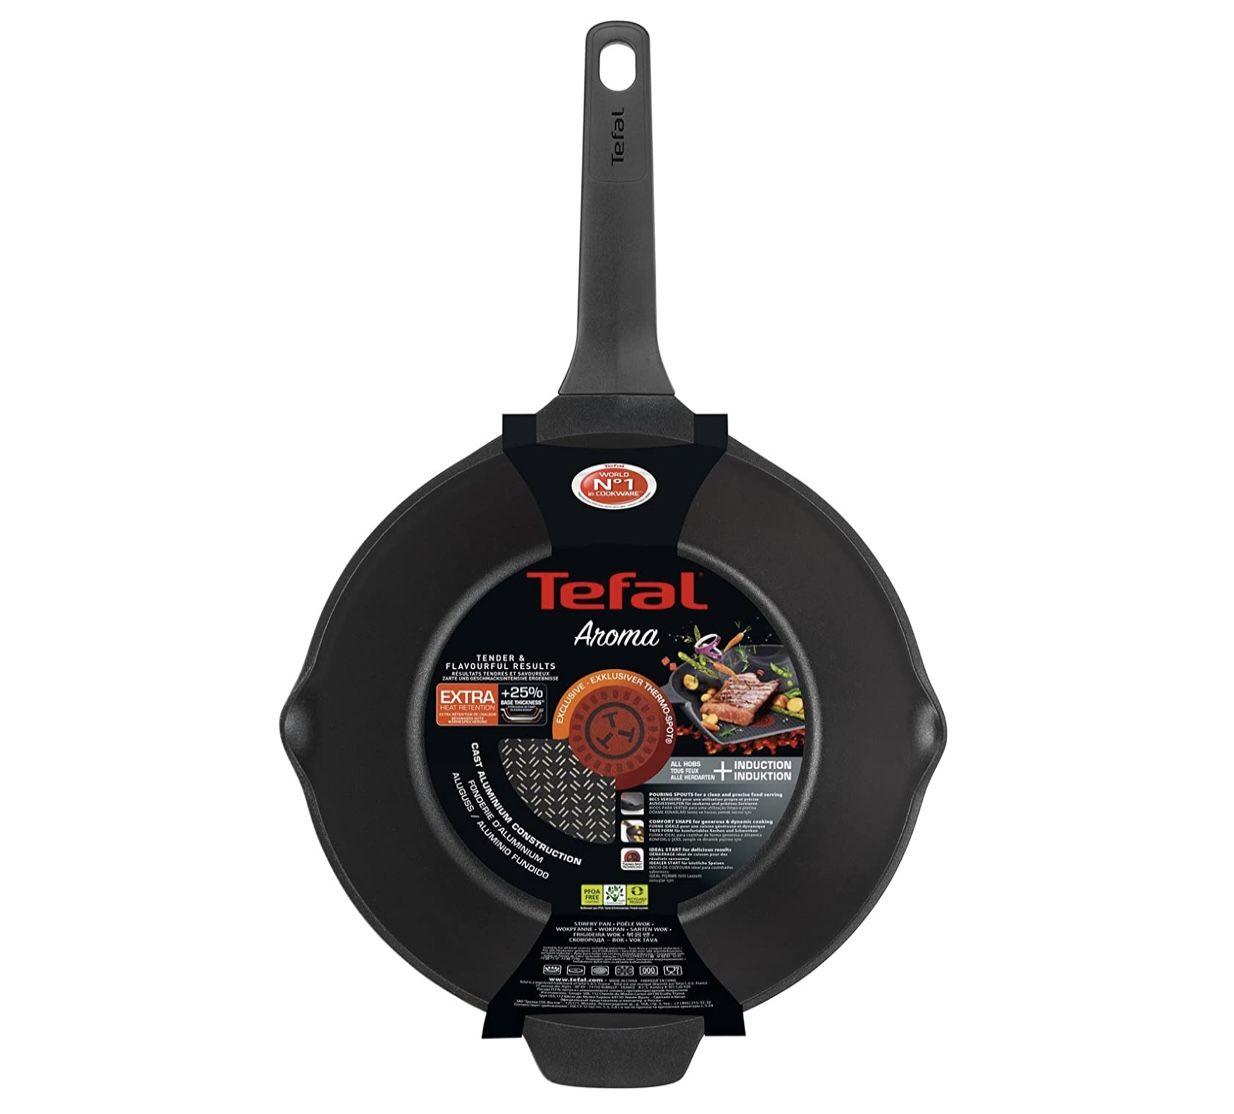 Tefal Aroma E21519 28cm Wokpfanne für 32,10€ (statt 39€)